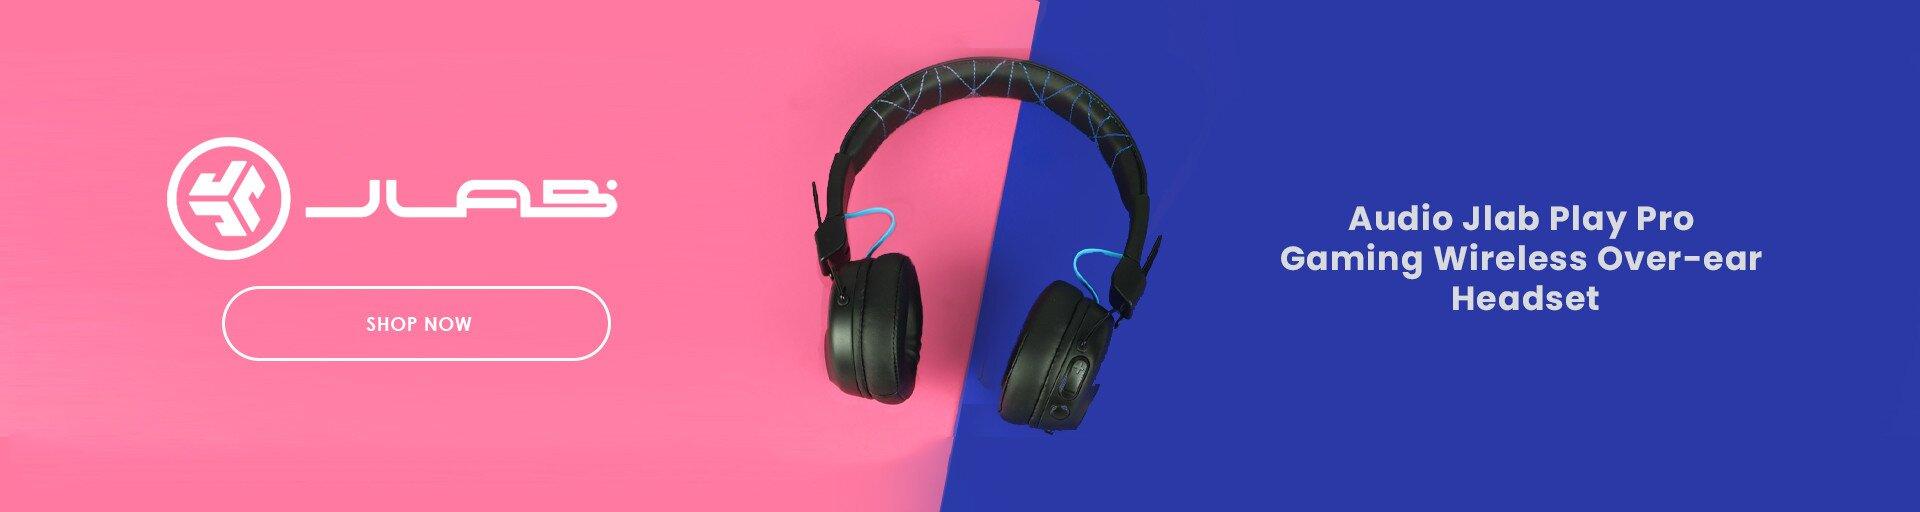 JLab Audio Jlab Play Pro Gaming Wireless Over-ear Headset